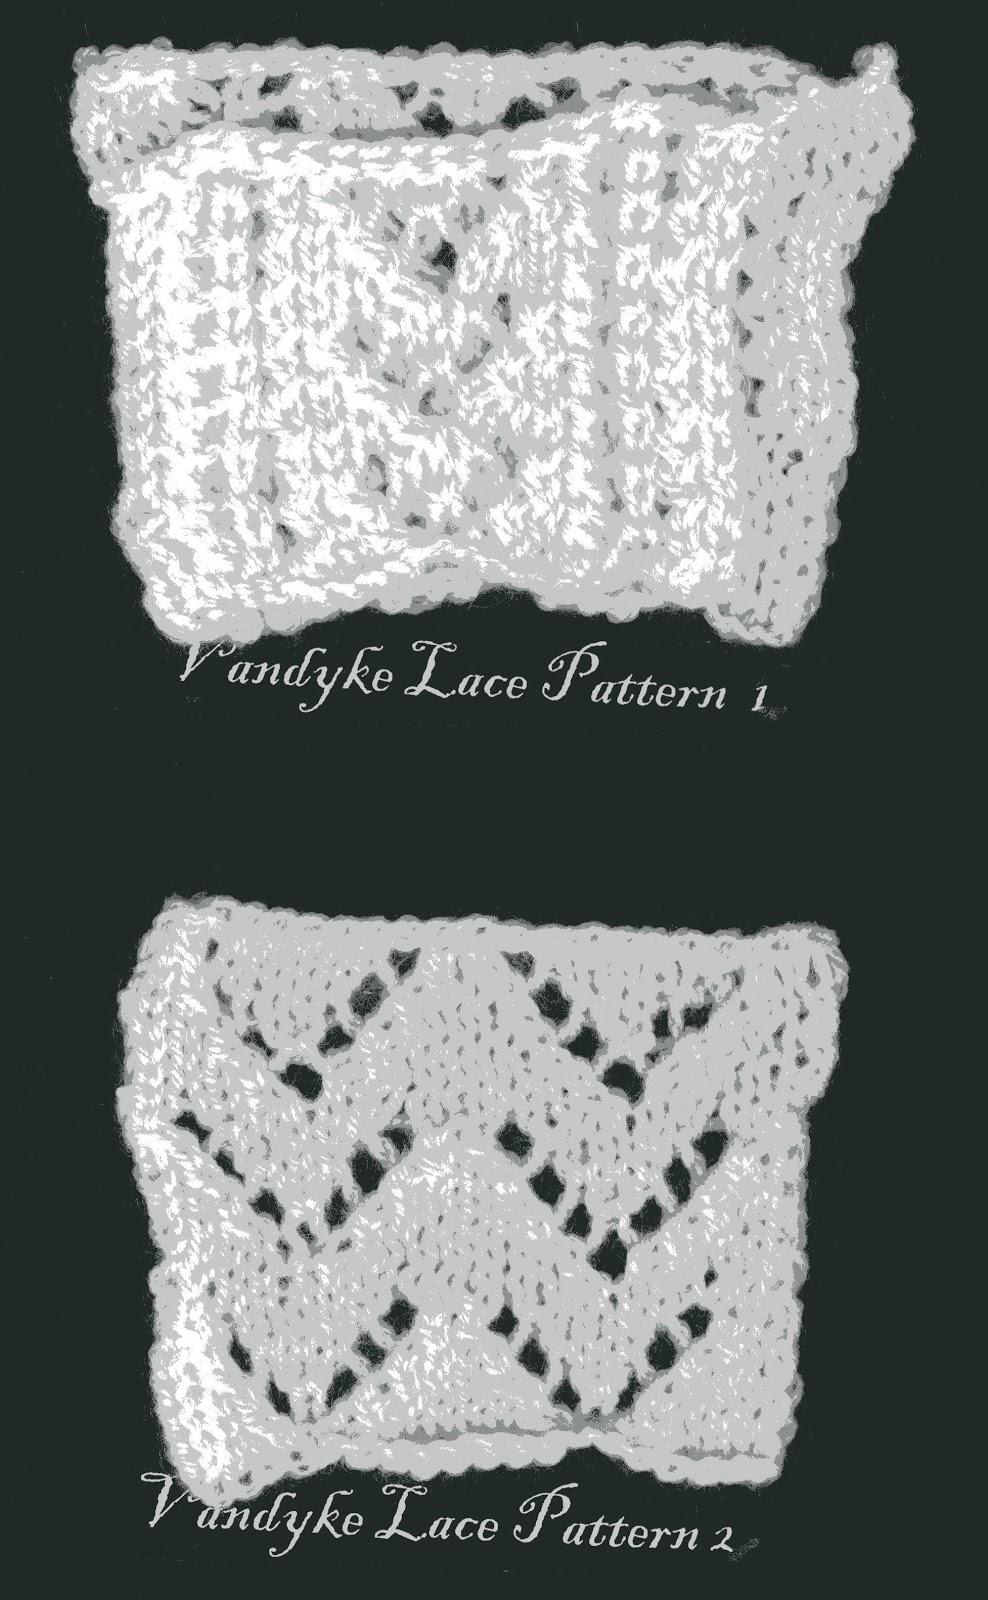 Vandyke Lace Knitting Pattern : Elizabeth Emery: Different Knit Stitches Swatches